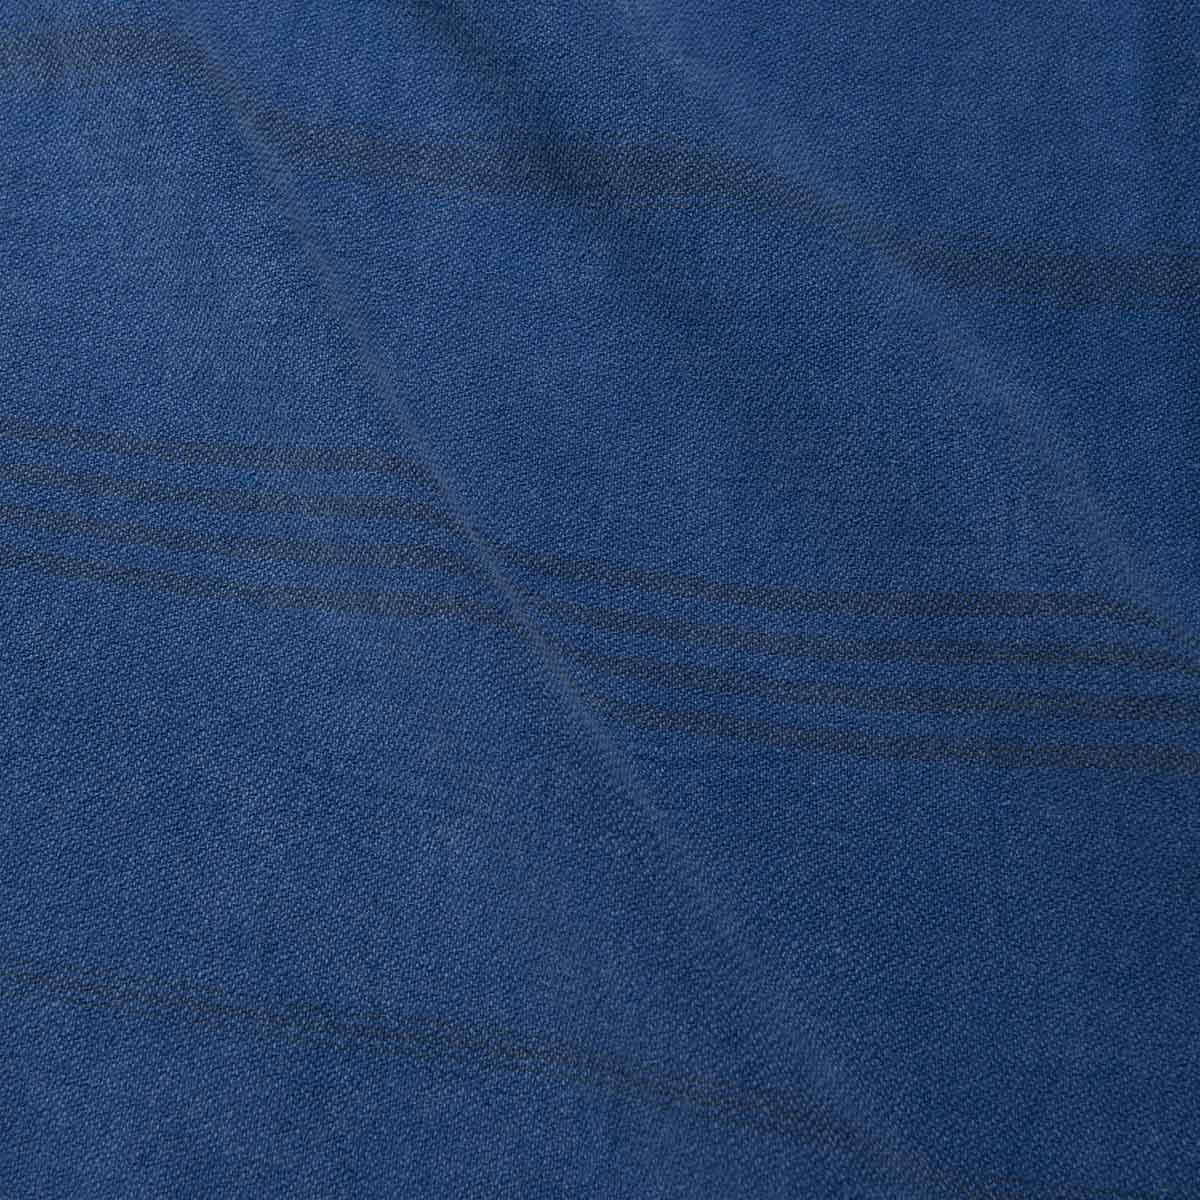 Peshtemal Devrim - Royal Blue / Dark Grey (StoneWashed)